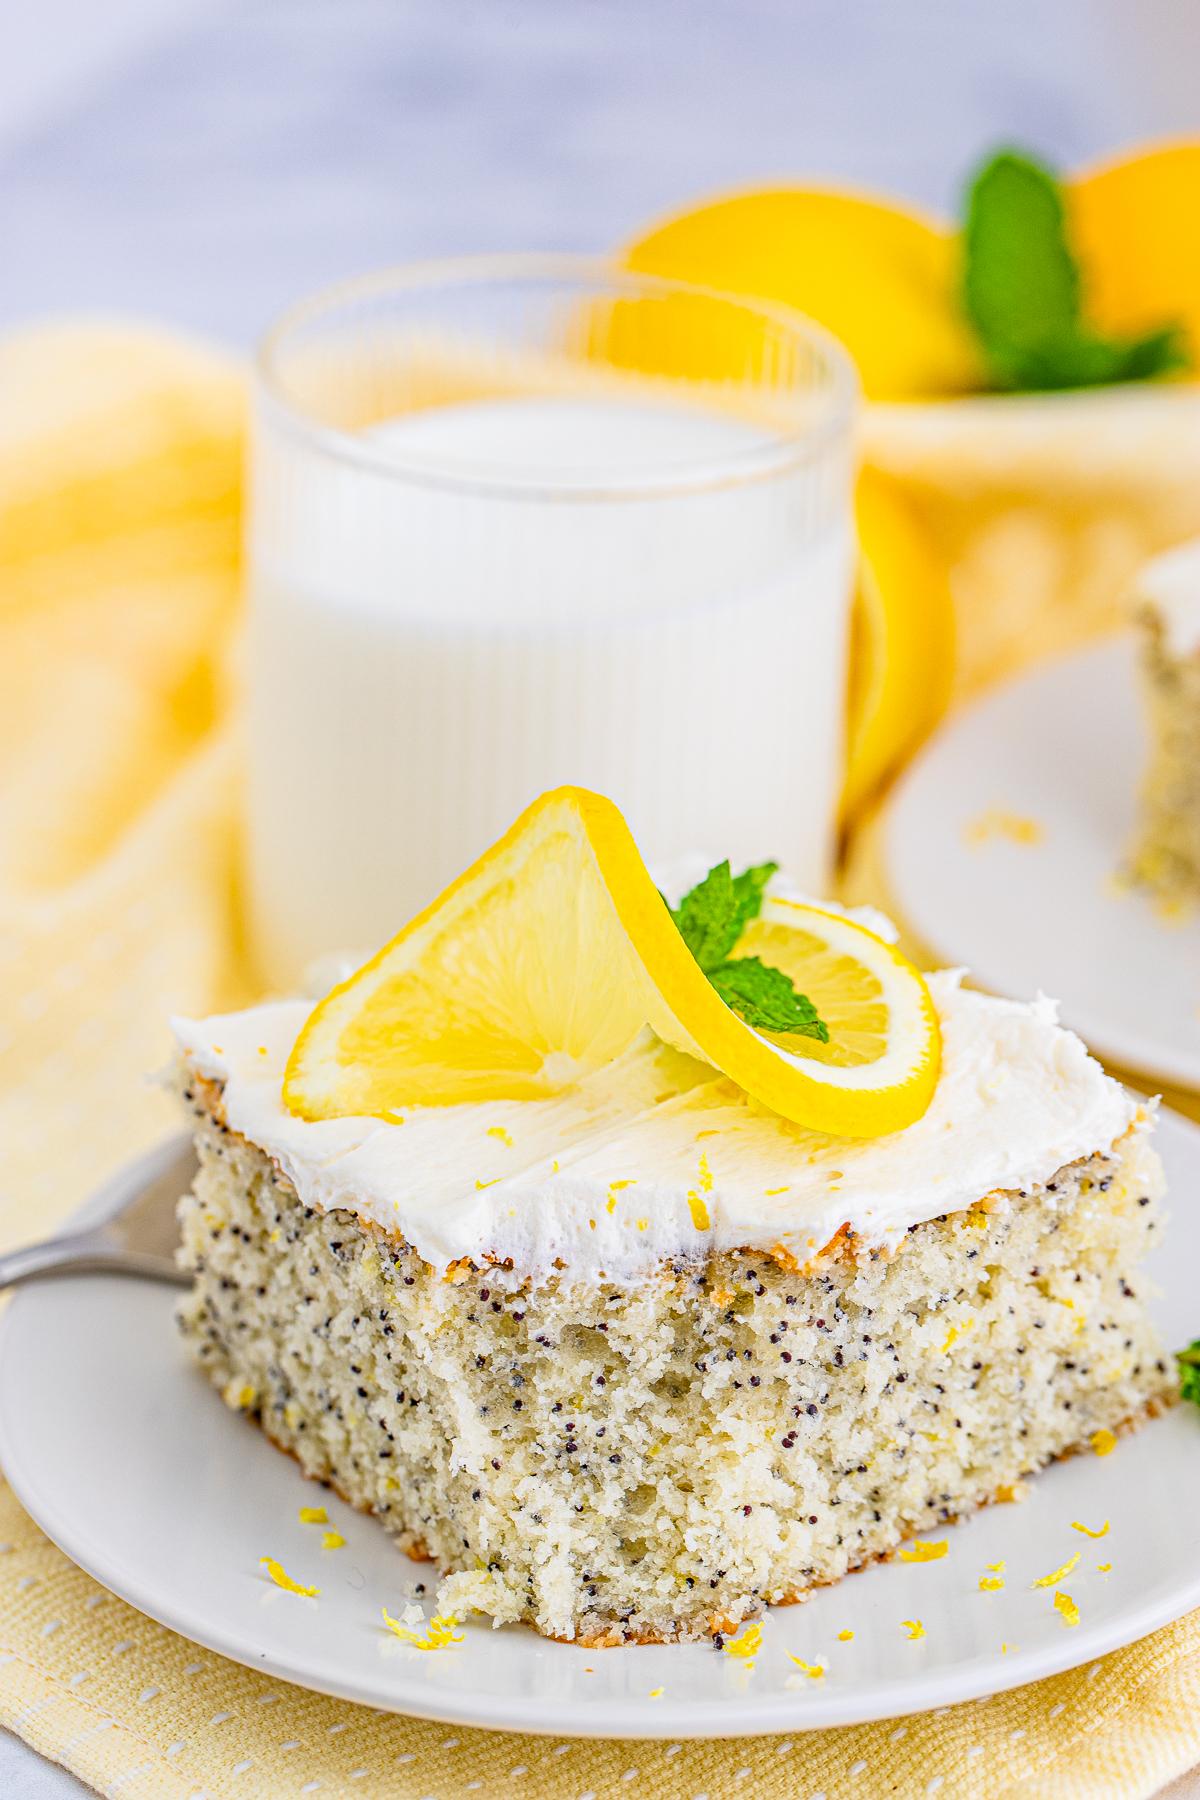 Slice of Lemon Poppy Seed Cake showing bite taken out